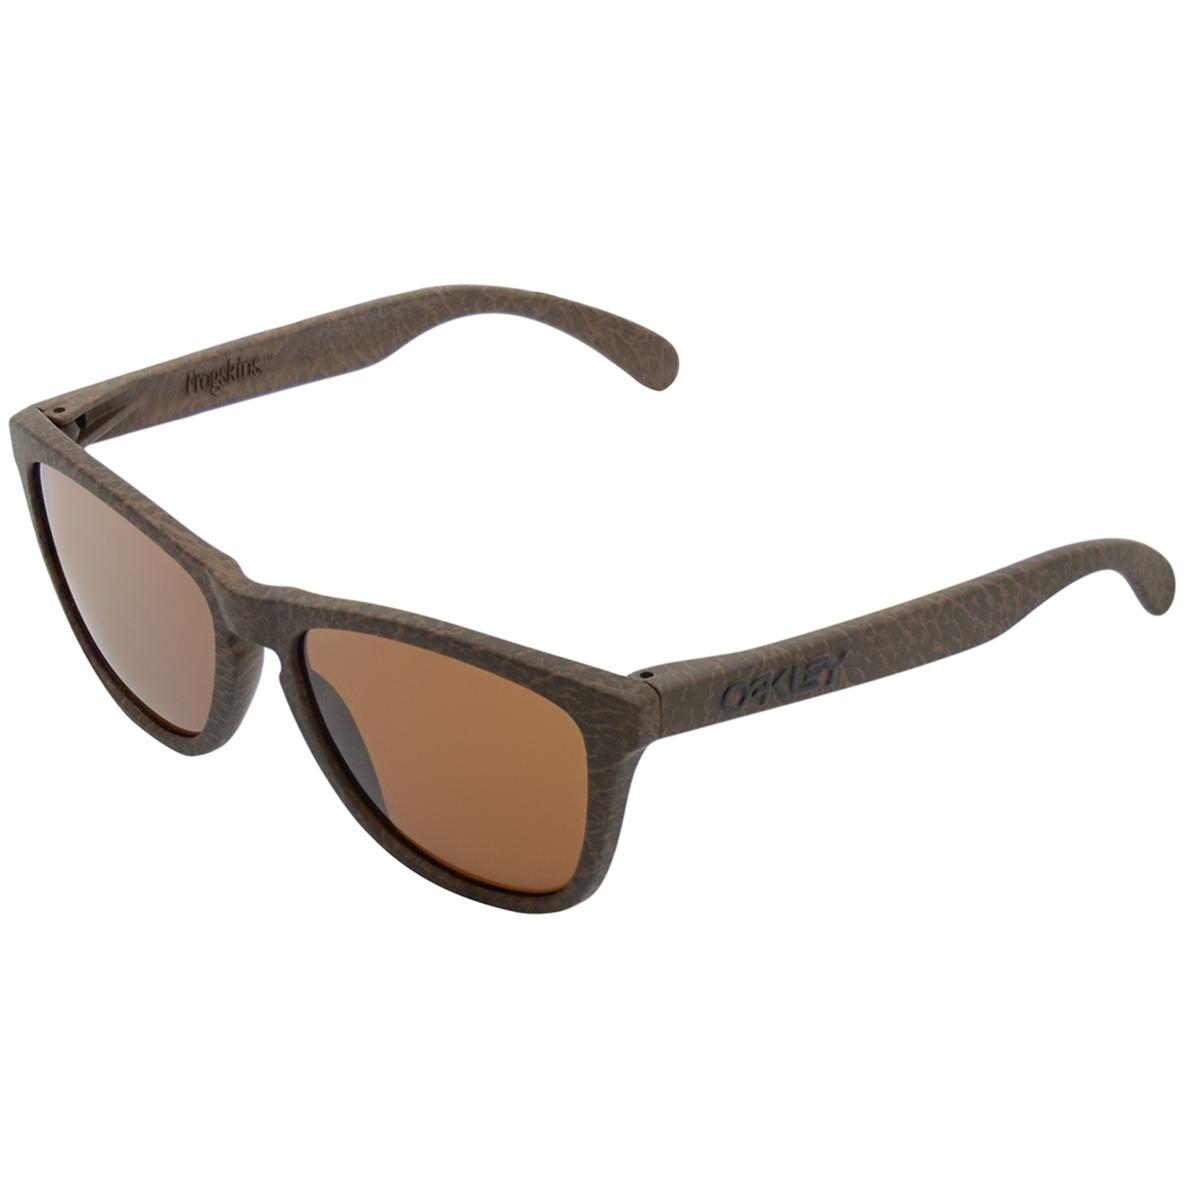 369e88d8f5d60 Óculos Oakley Frogskins Tobacco  Lente Dark Bronze - R  519,90 em ...